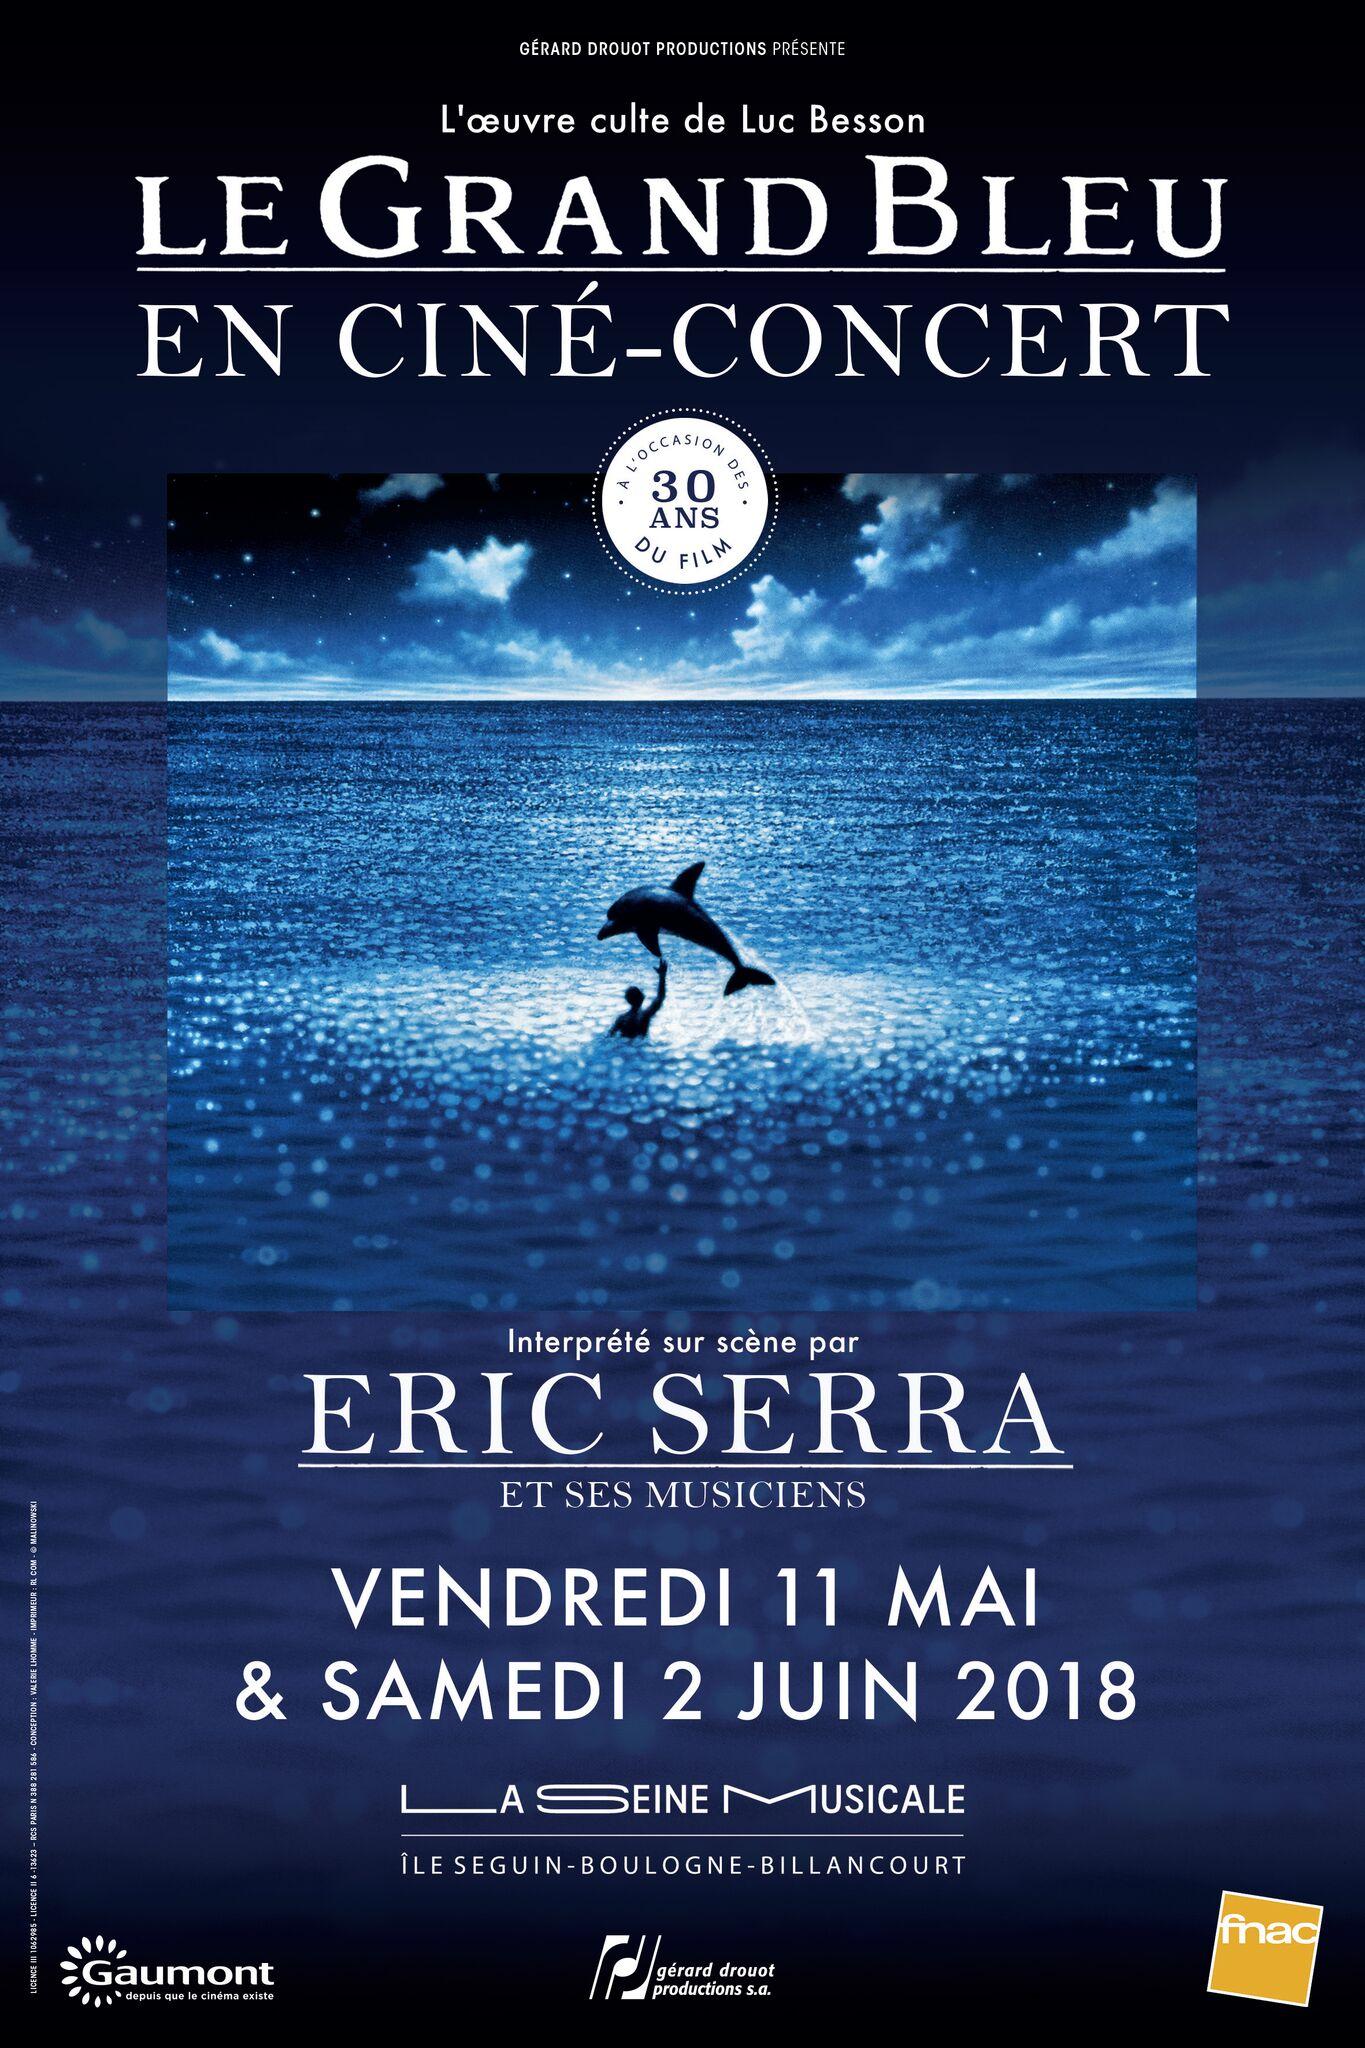 Le grand bleu cine-concert